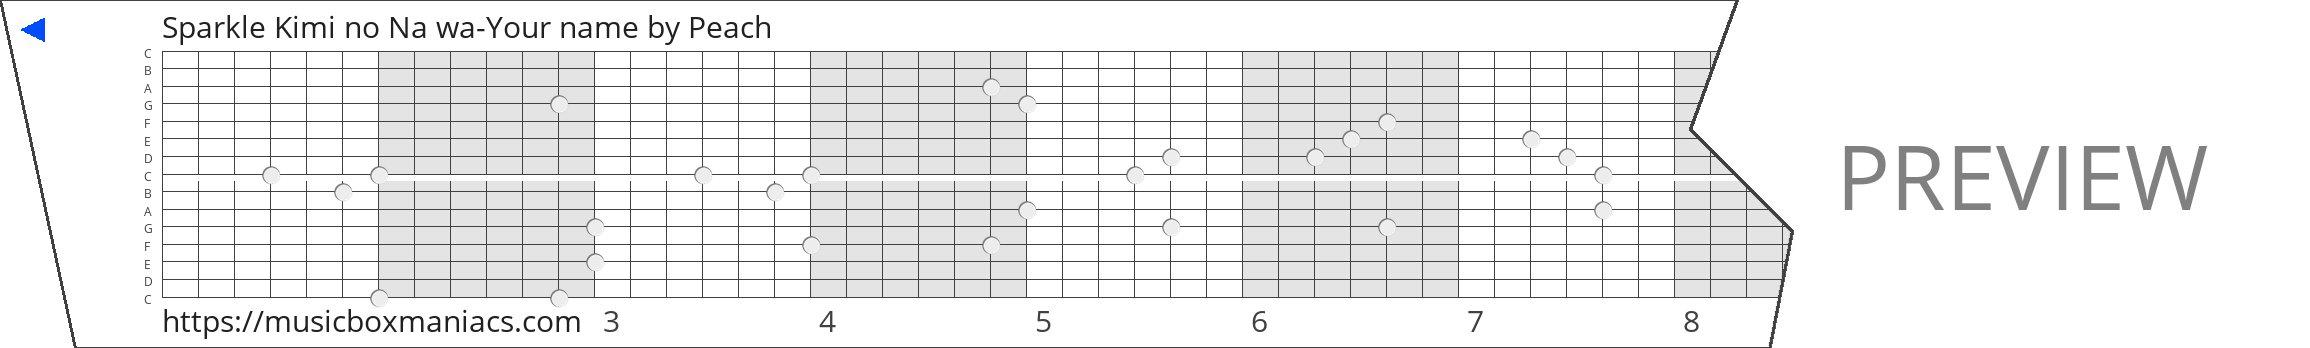 Sparkle Kimi no Na wa-Your name 15 note music box paper strip